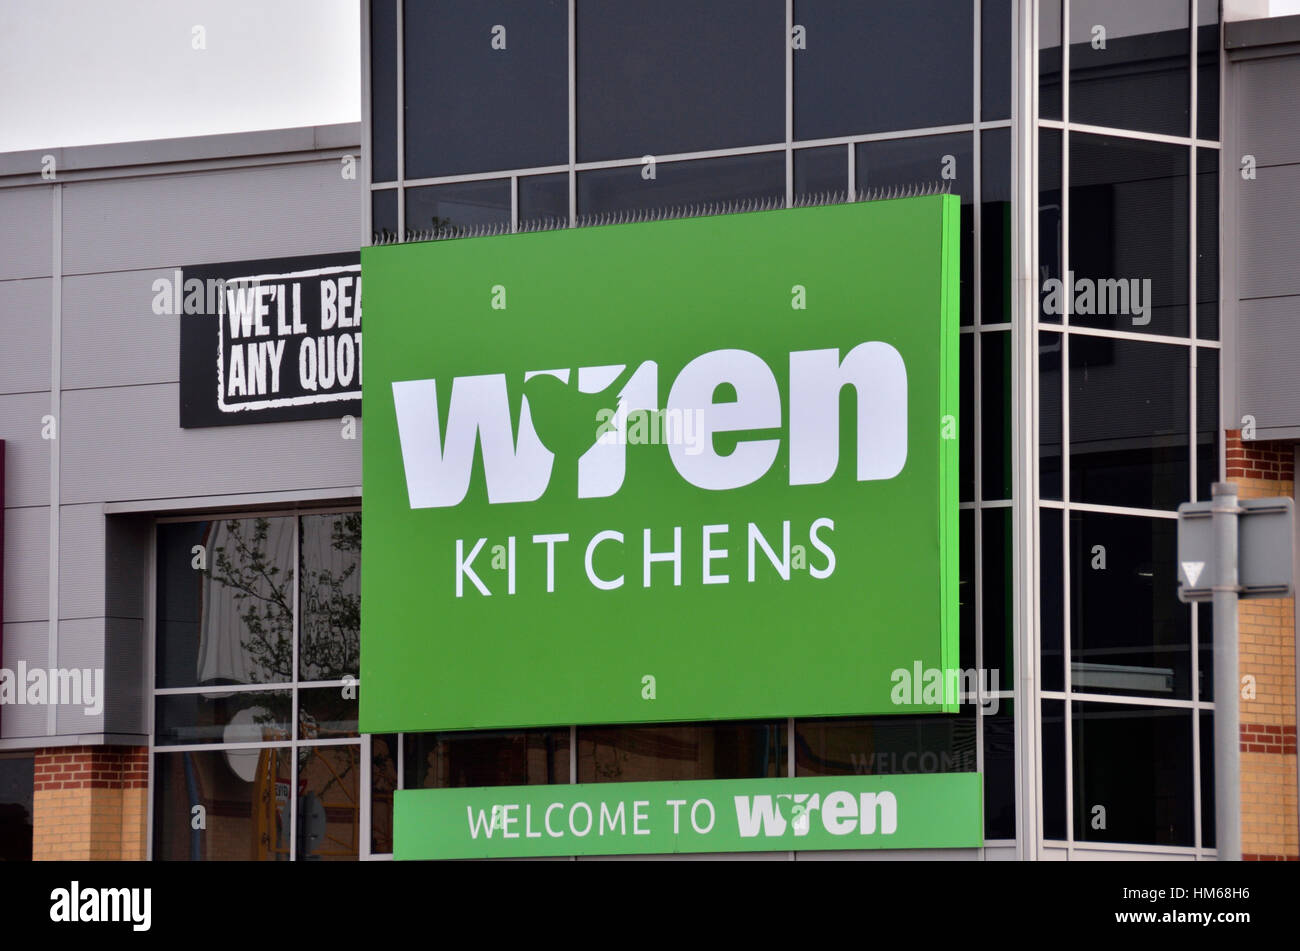 Wren Kitchens superstore at Staples Corner Retail Park, London, UK - Stock Image